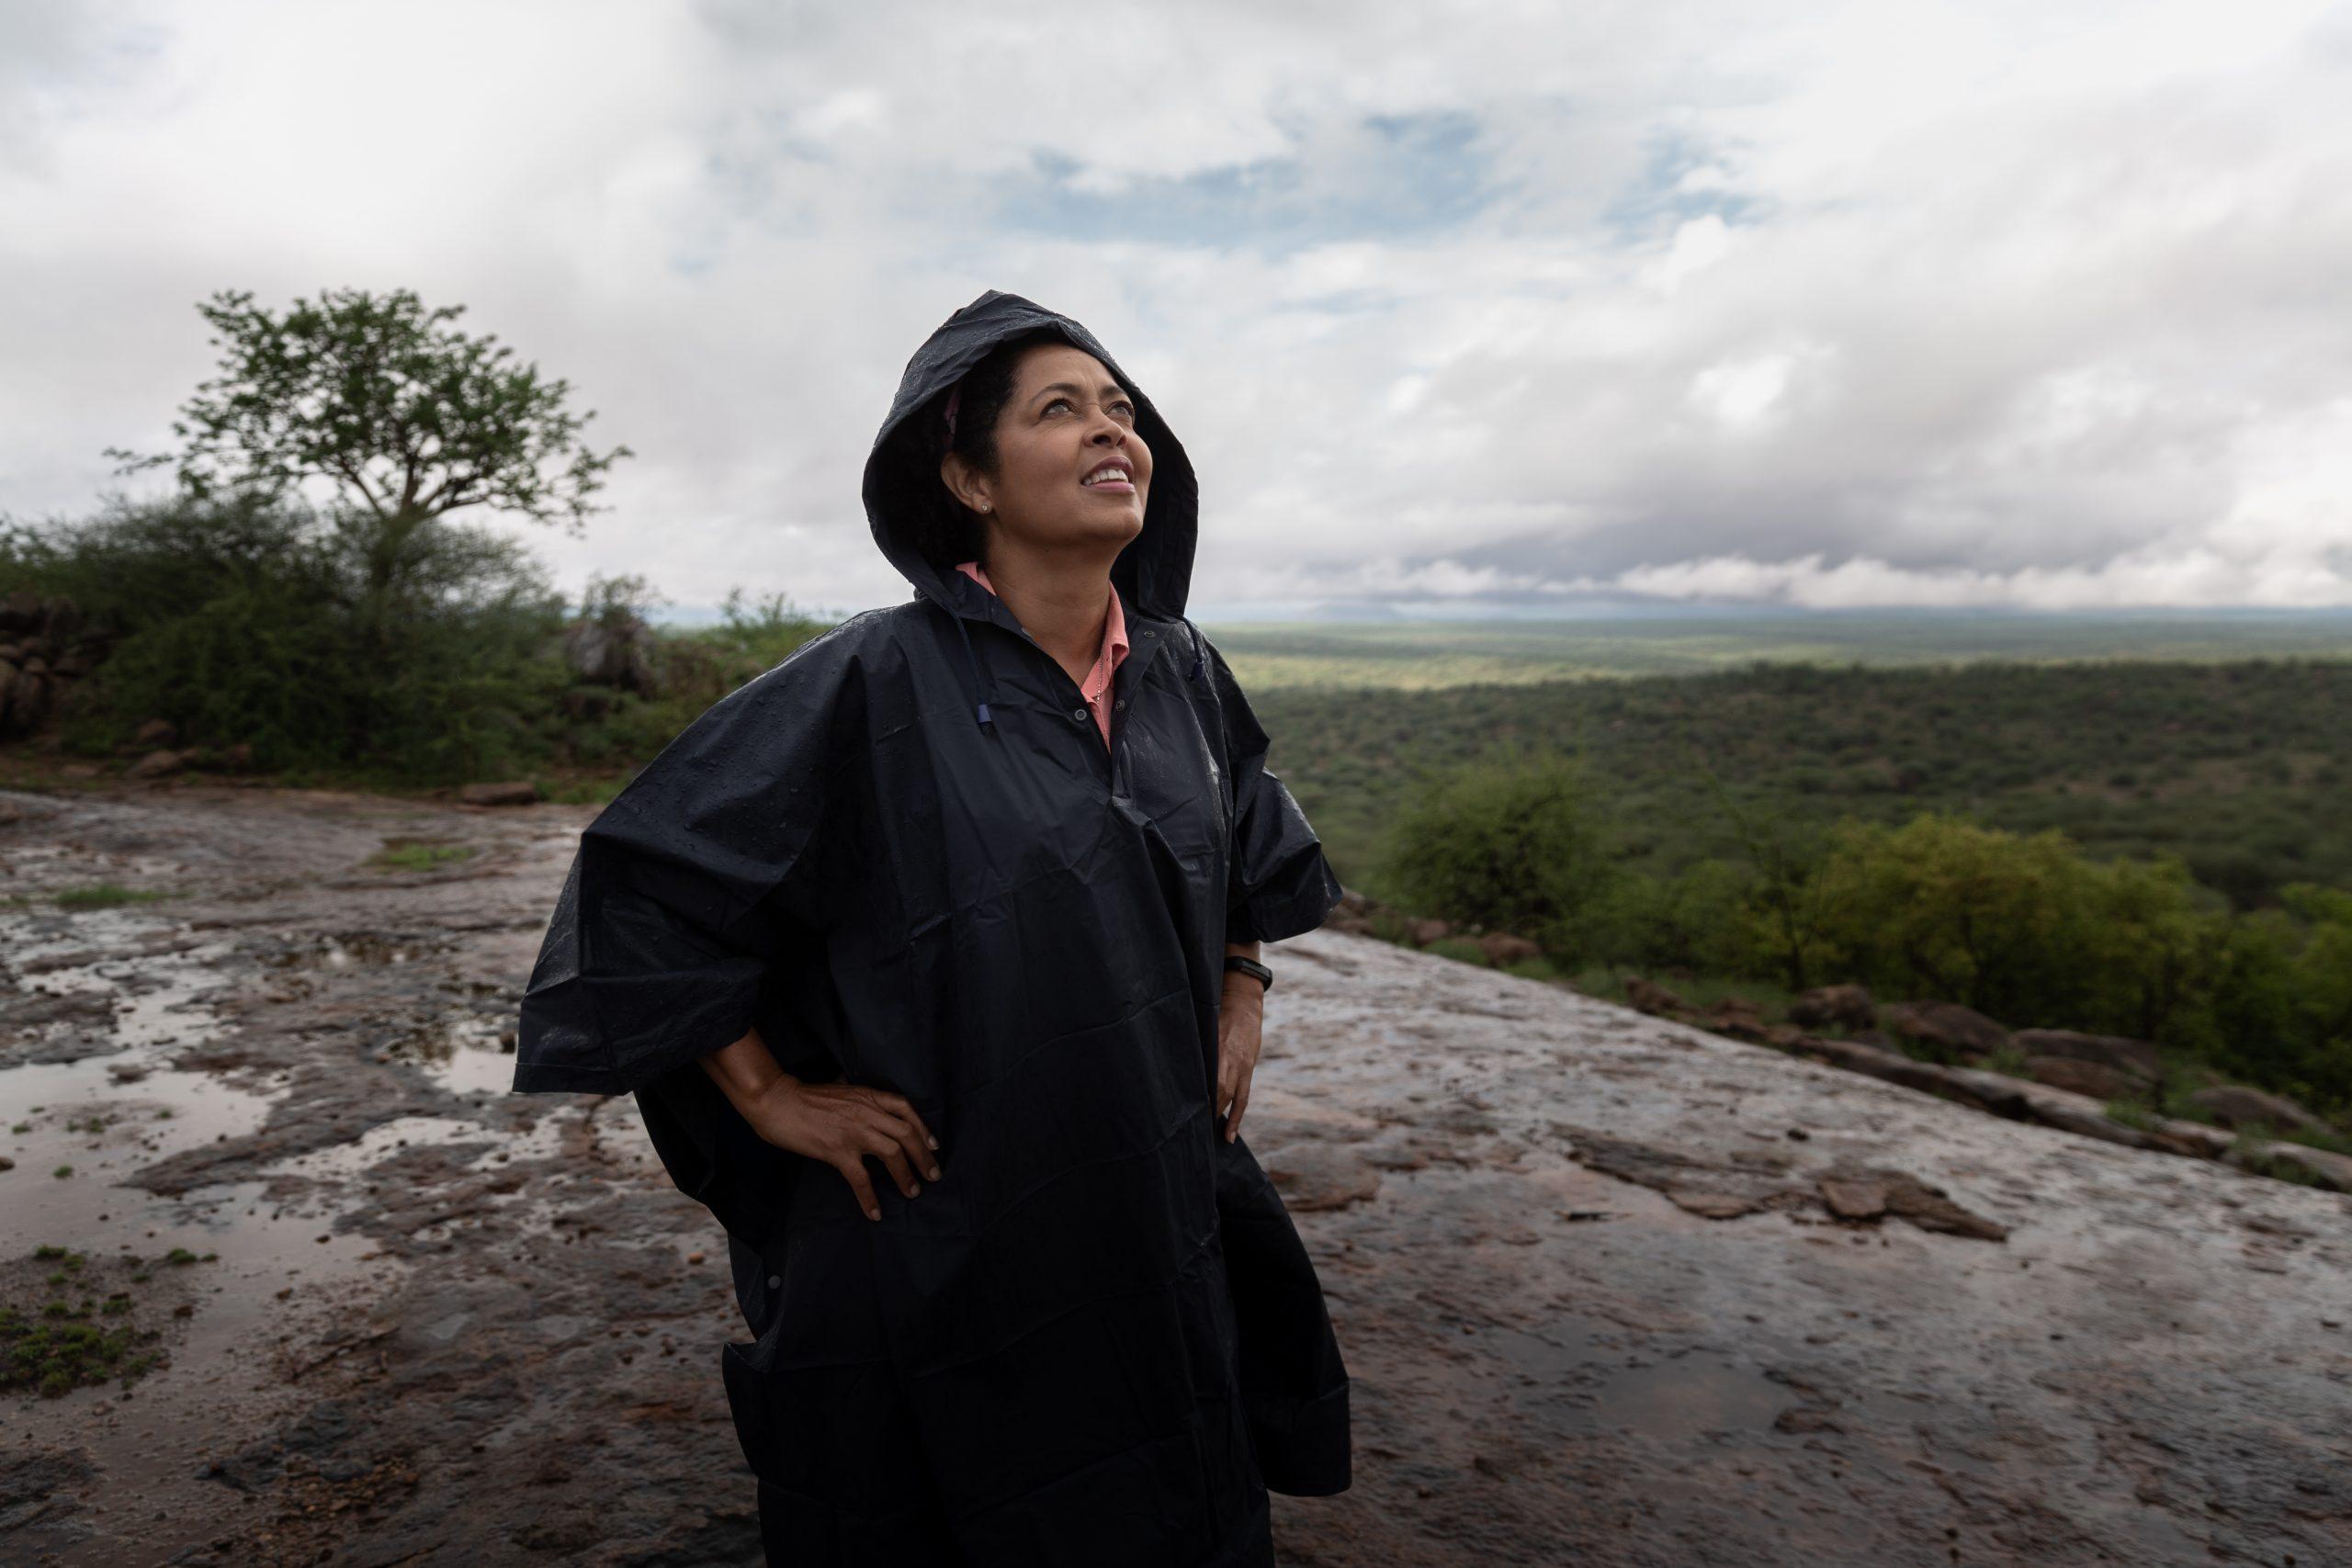 WildlifeDirect CEO Dr. Paula Kahumbu wins prestigious Whitley Gold Award